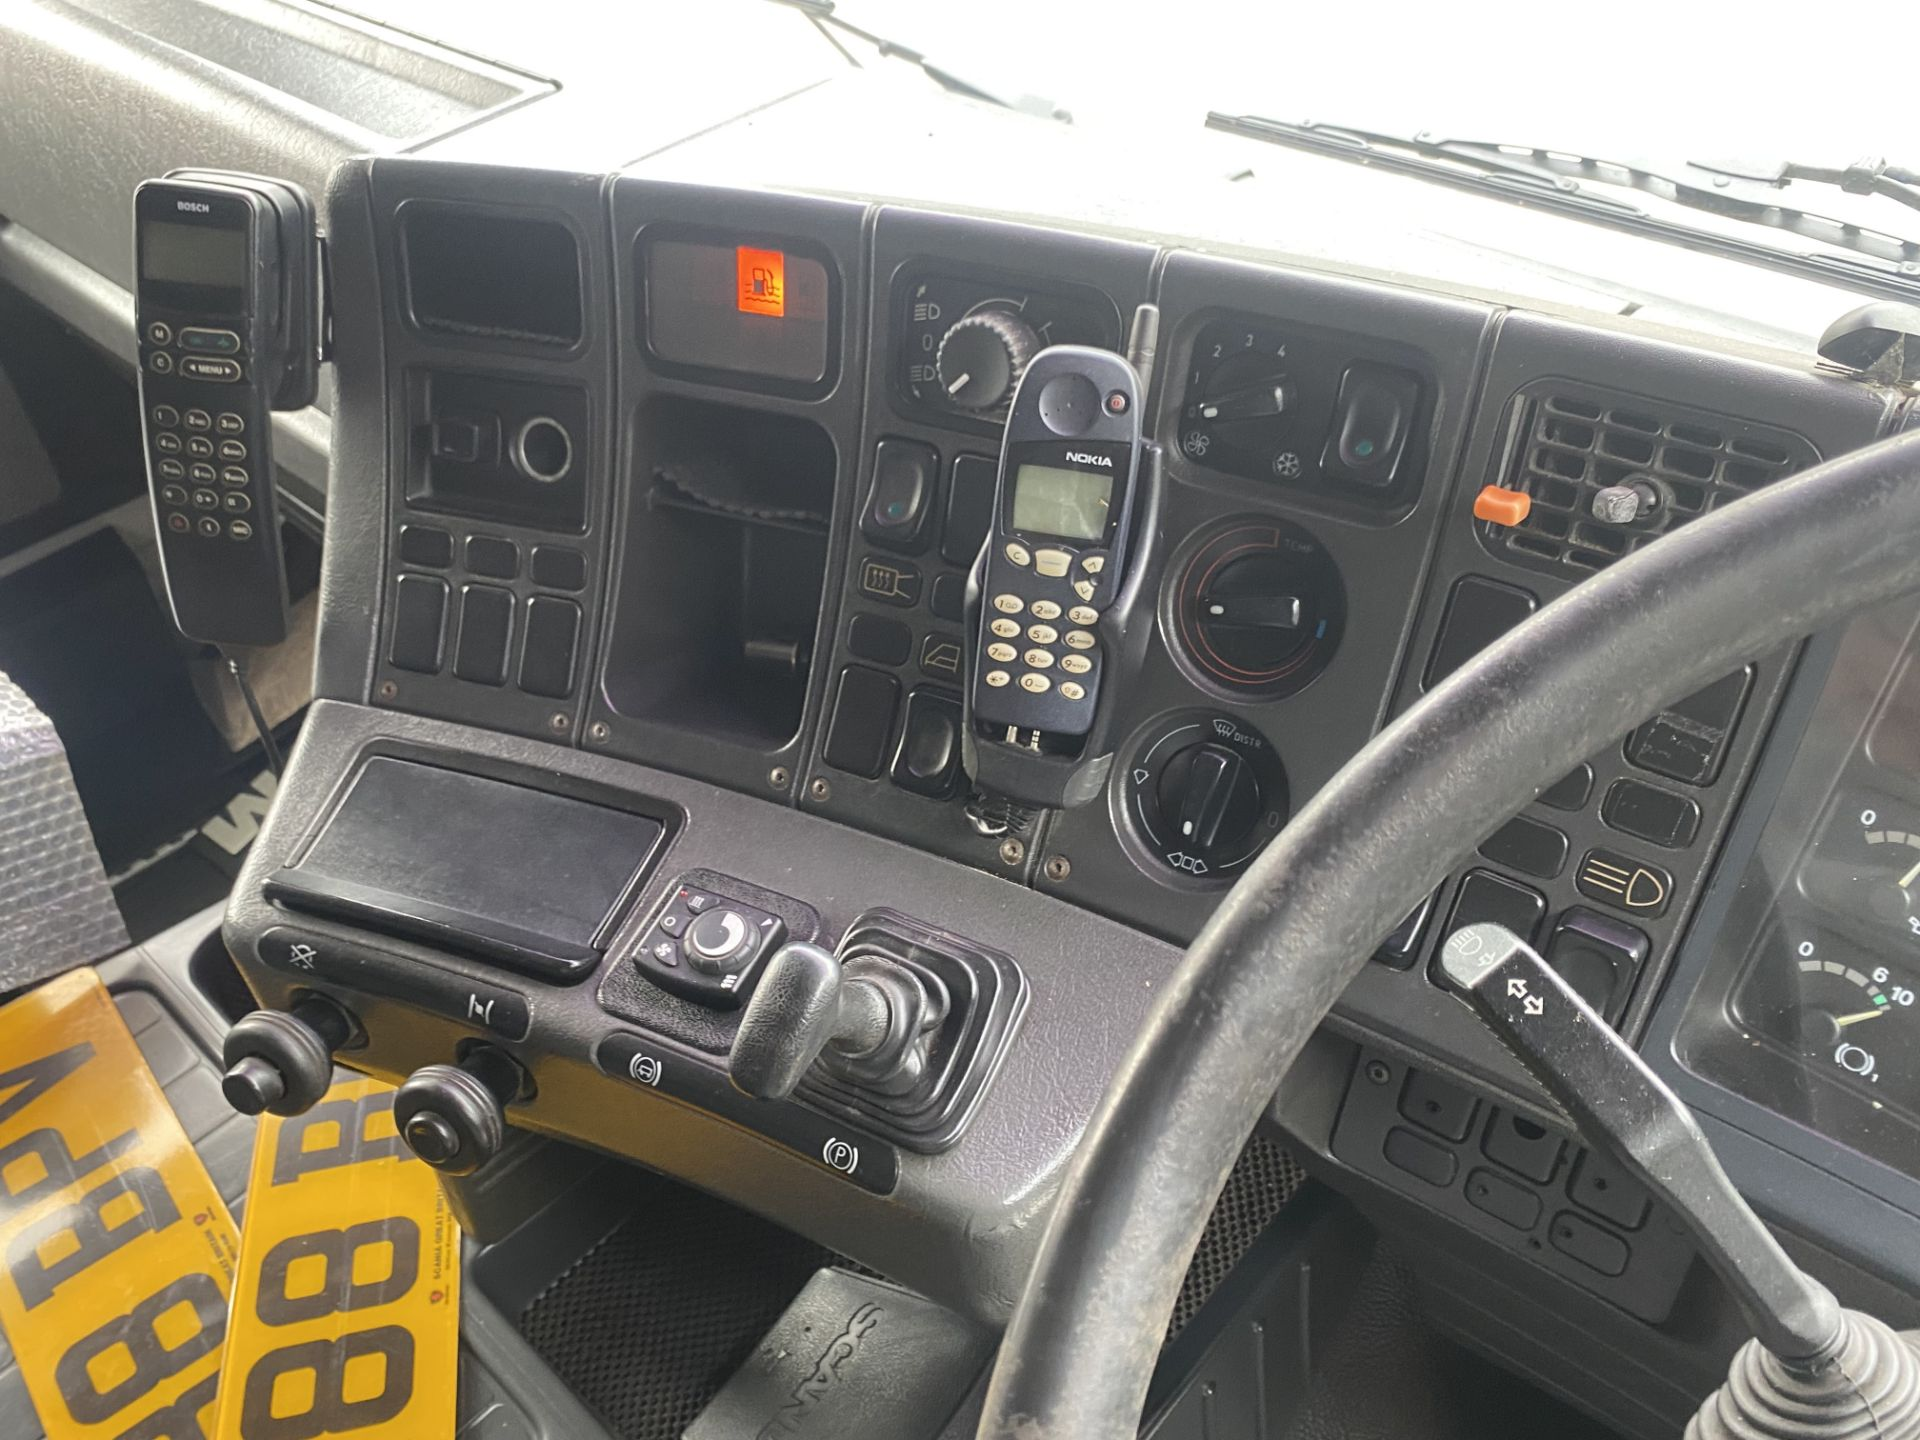 Scania 143M450 V8 4X2 TRACTOR UNIT, registration no. L288 BPV, date first registered 01/08/1993, - Image 19 of 20